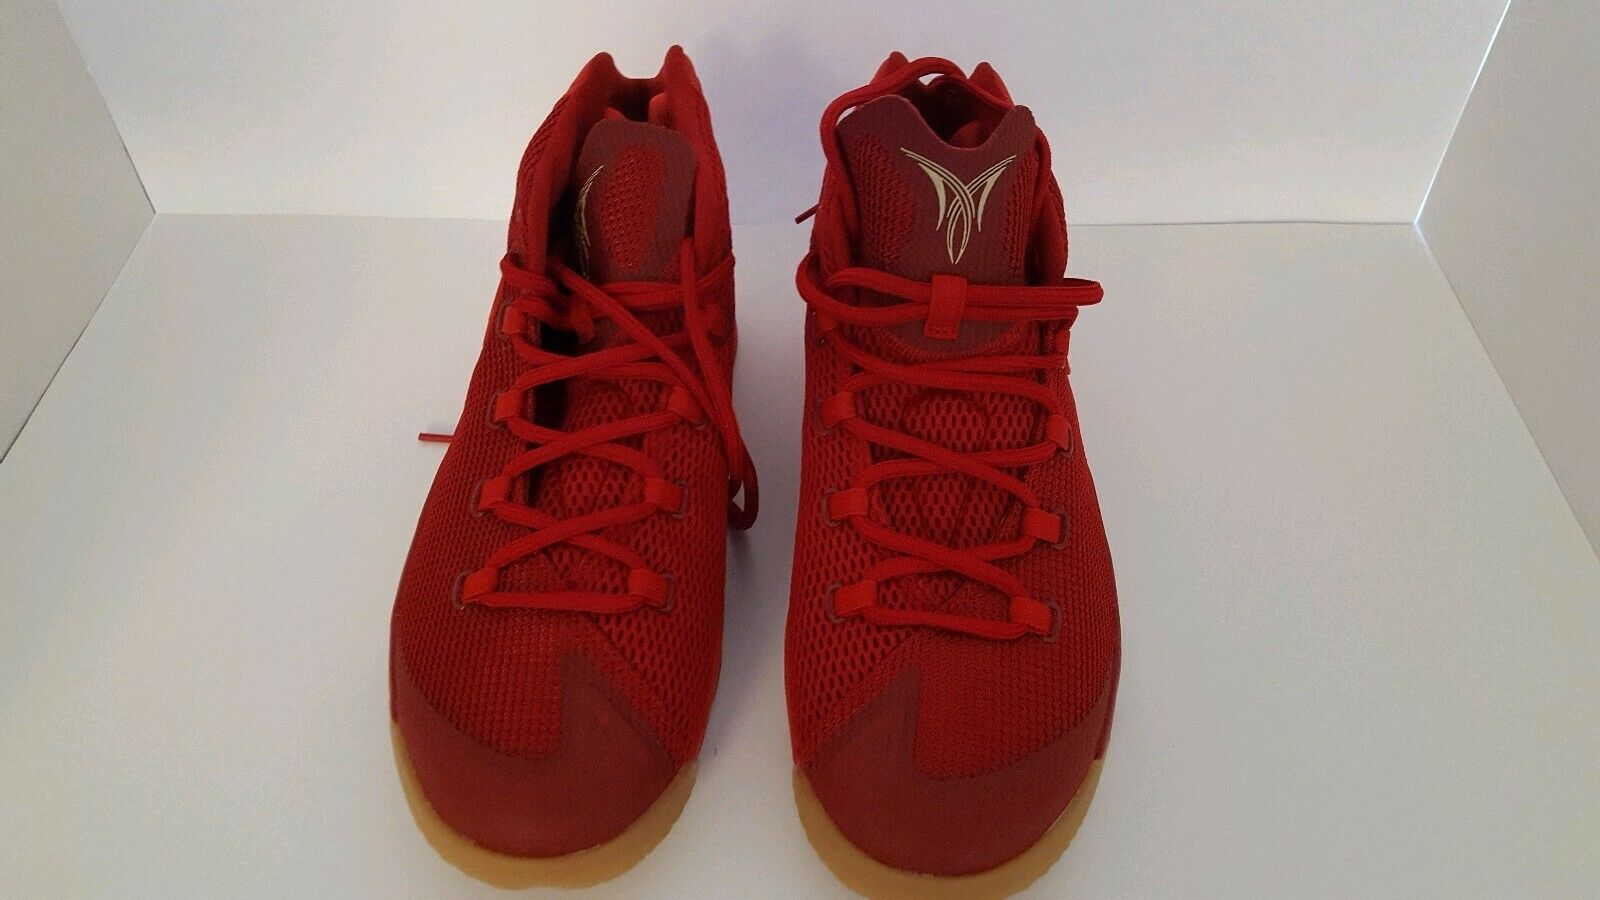 Nike Jordan Melo M12, Gym Red Challenge Red  Metallic gold, 827176 696, Size 8.5